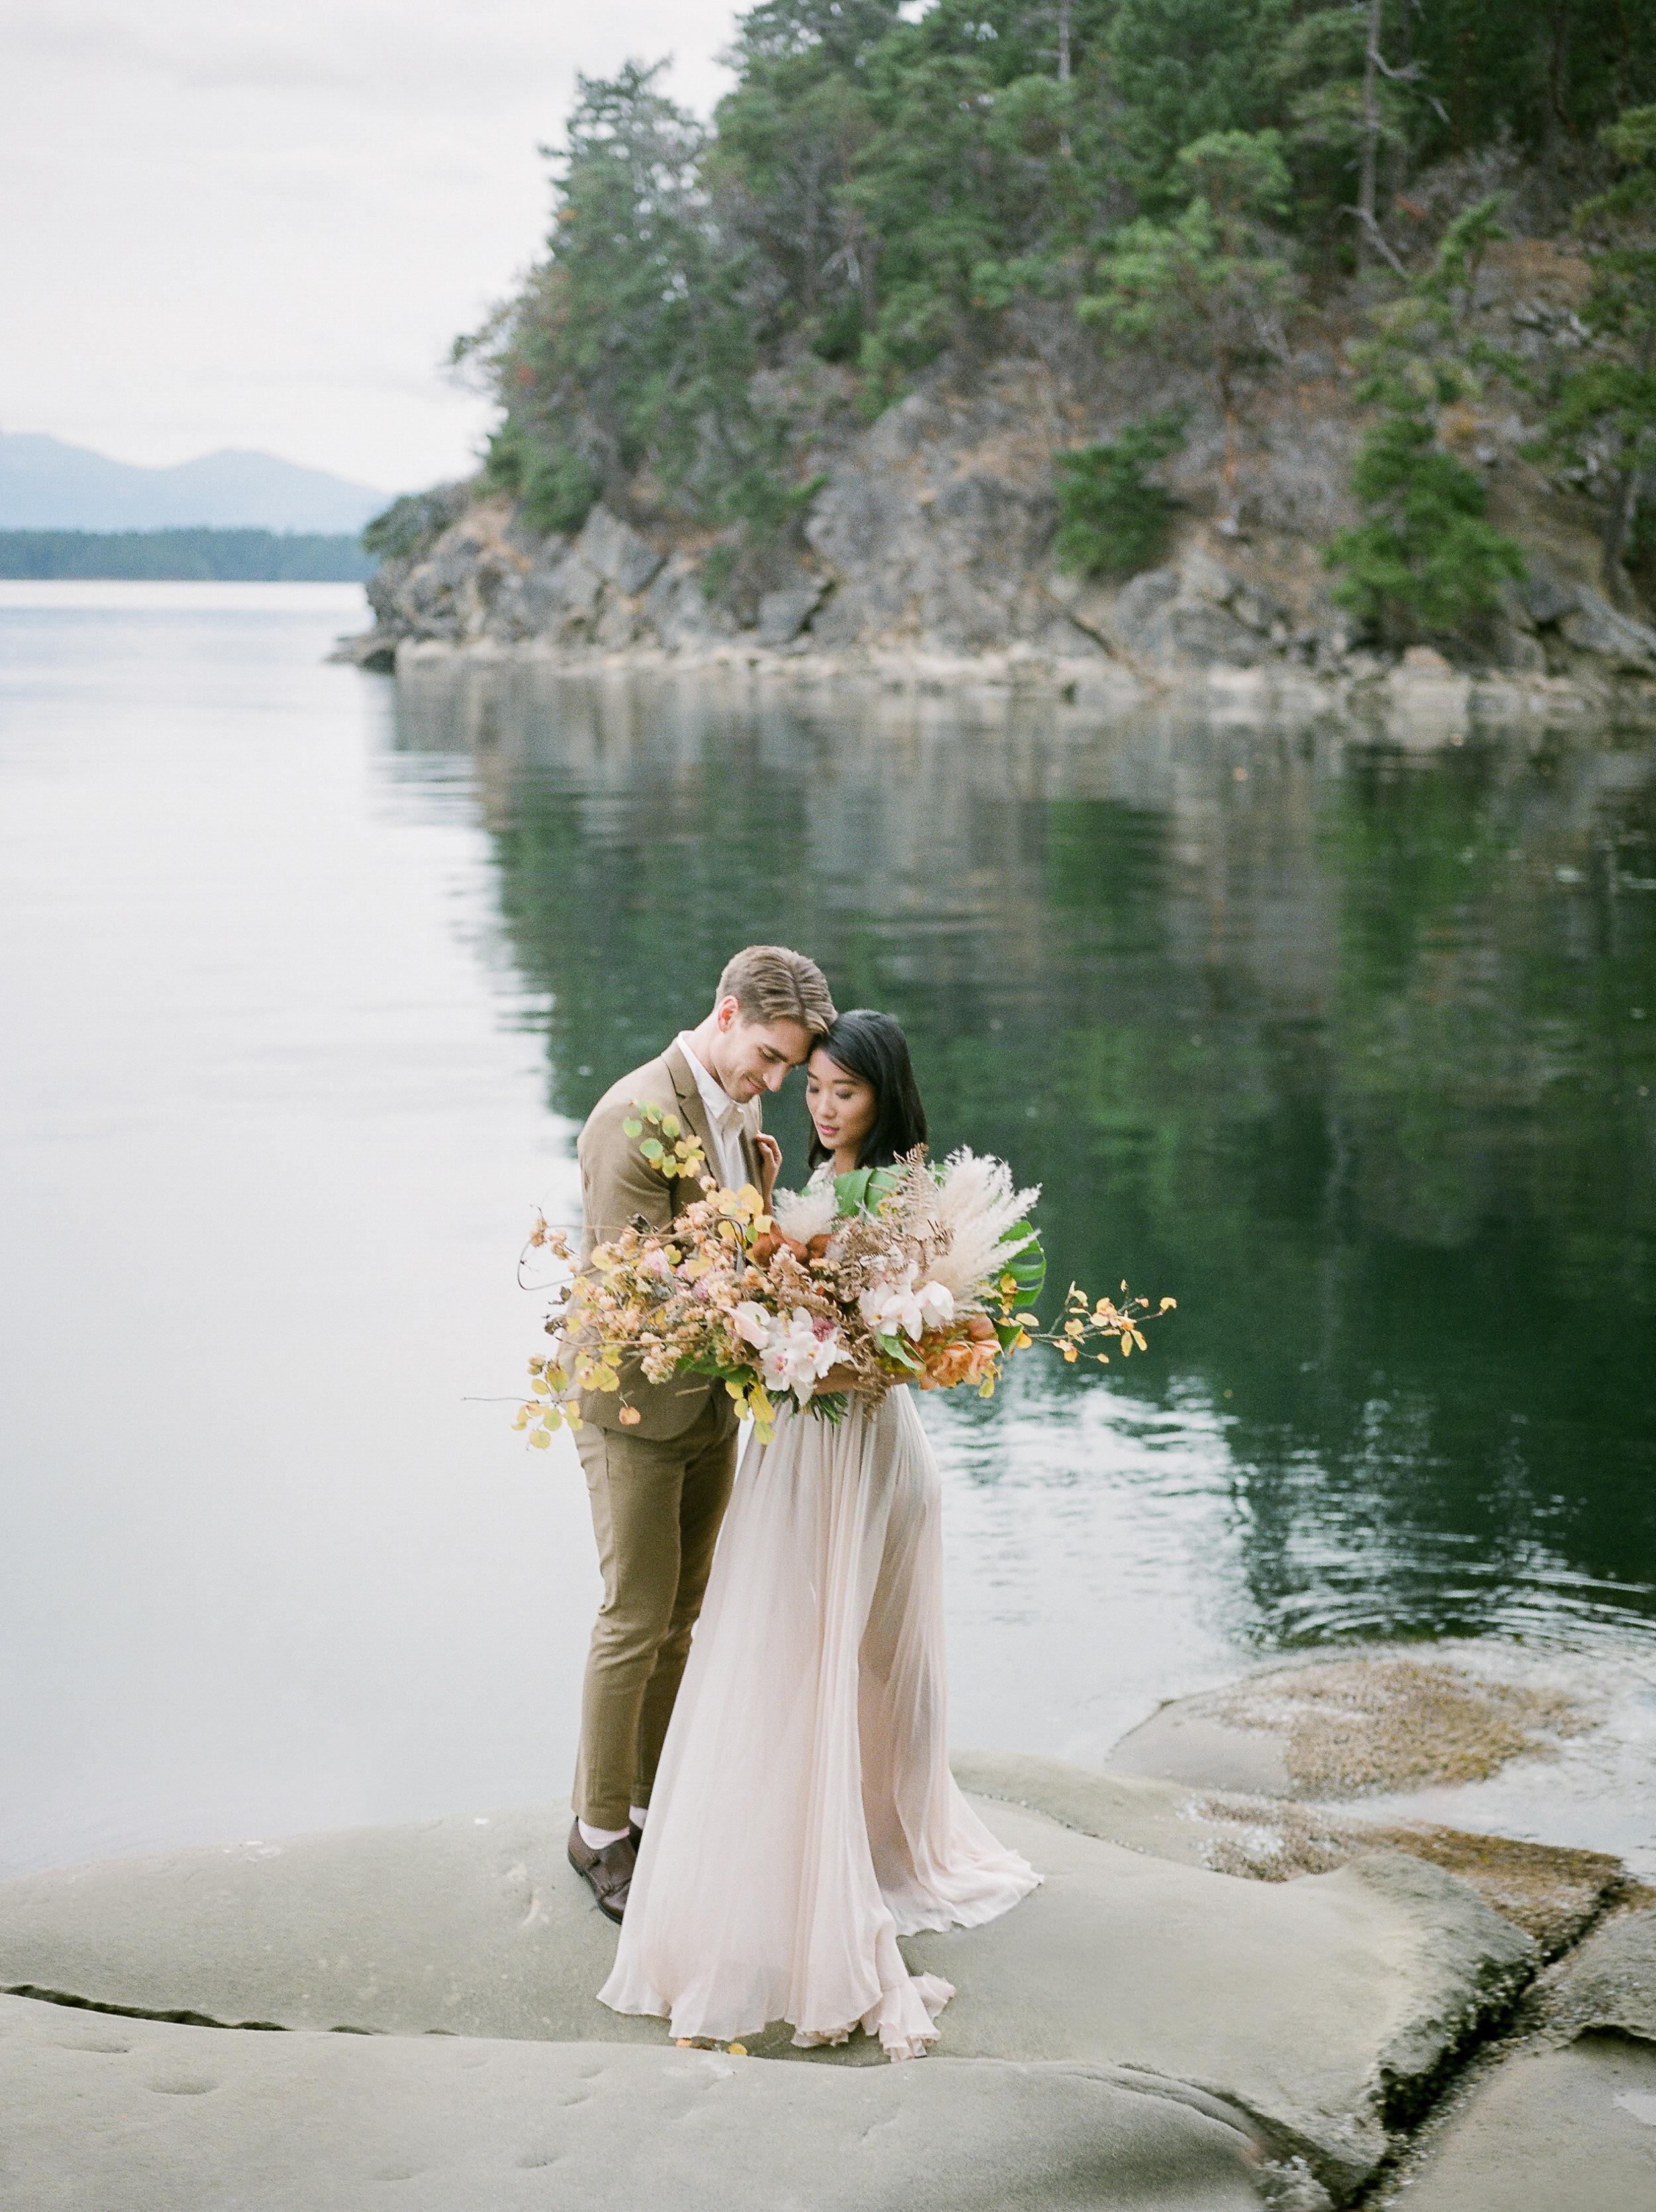 BC Wedding Photographer, Fine Art Wedding, Leanne Marshall Wedding Dress, West Coast Wedding, PNW Wedding, Light & Airy Wedding Photographer